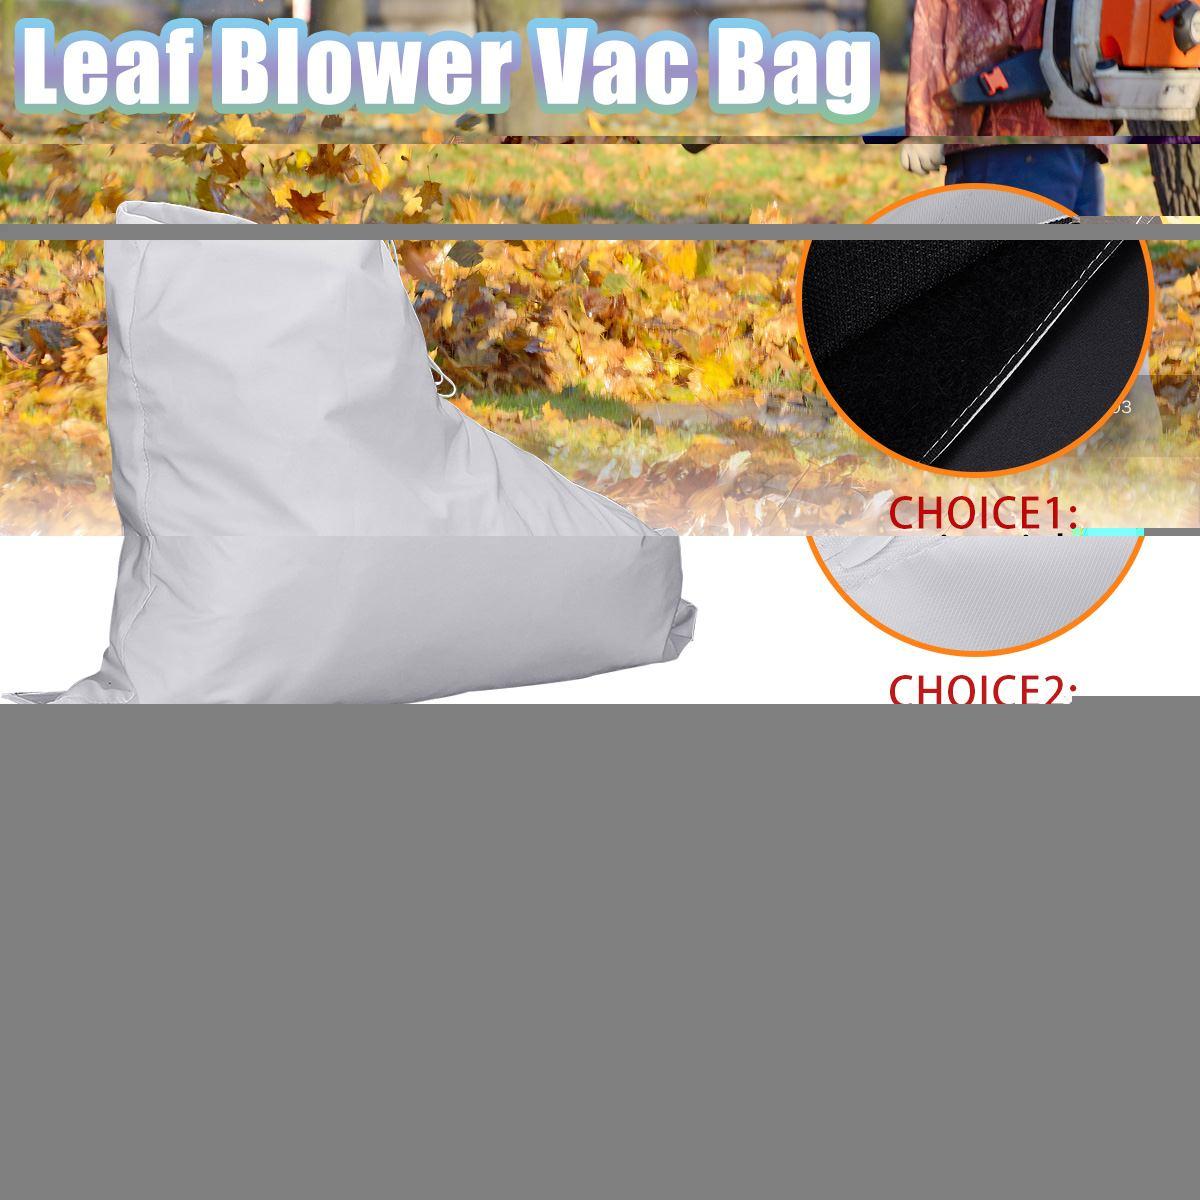 Velcro/Zipper Type Leaf Blower Vacuum Bag Fit For Weed Eater Barracuda 2595 Type 1 Lawn Yard Shredder Garden Tool Storage Bag